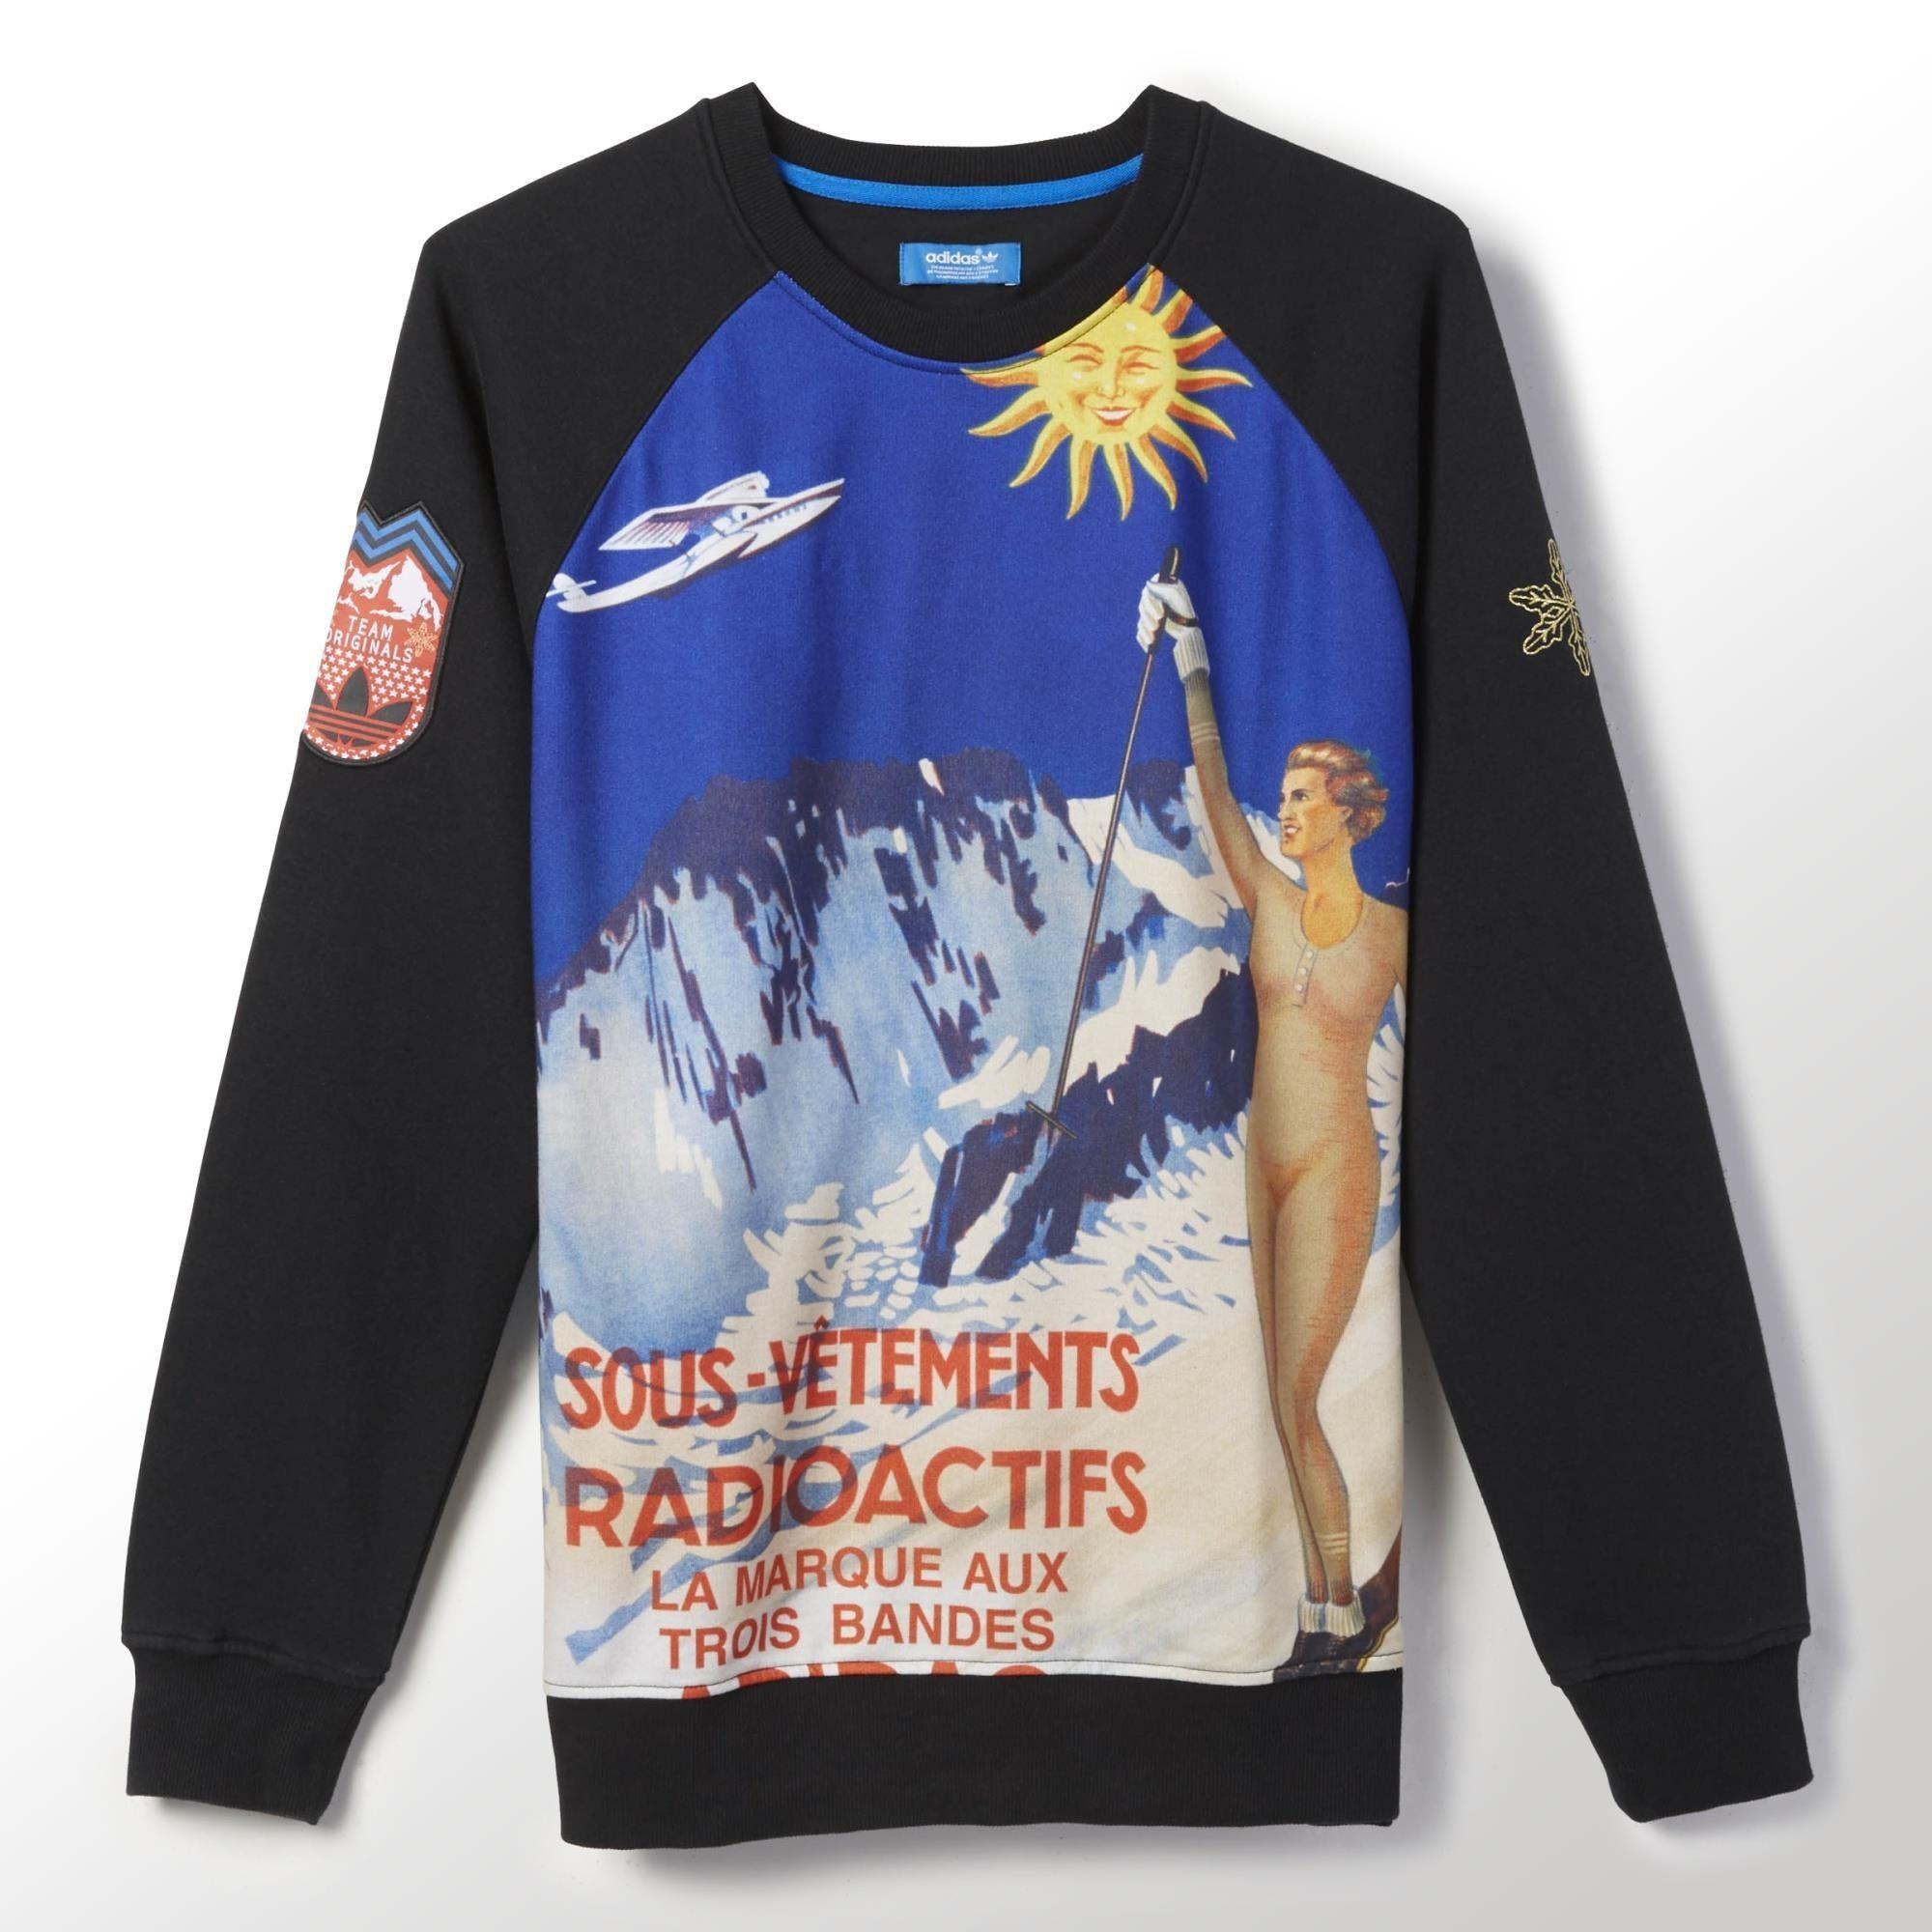 Adidas Radioactif Art Fleece Crew Sweatshirt Adidas Us Sweatshirts Crew Sweatshirts Fleece Sweatpants [ 2000 x 2000 Pixel ]